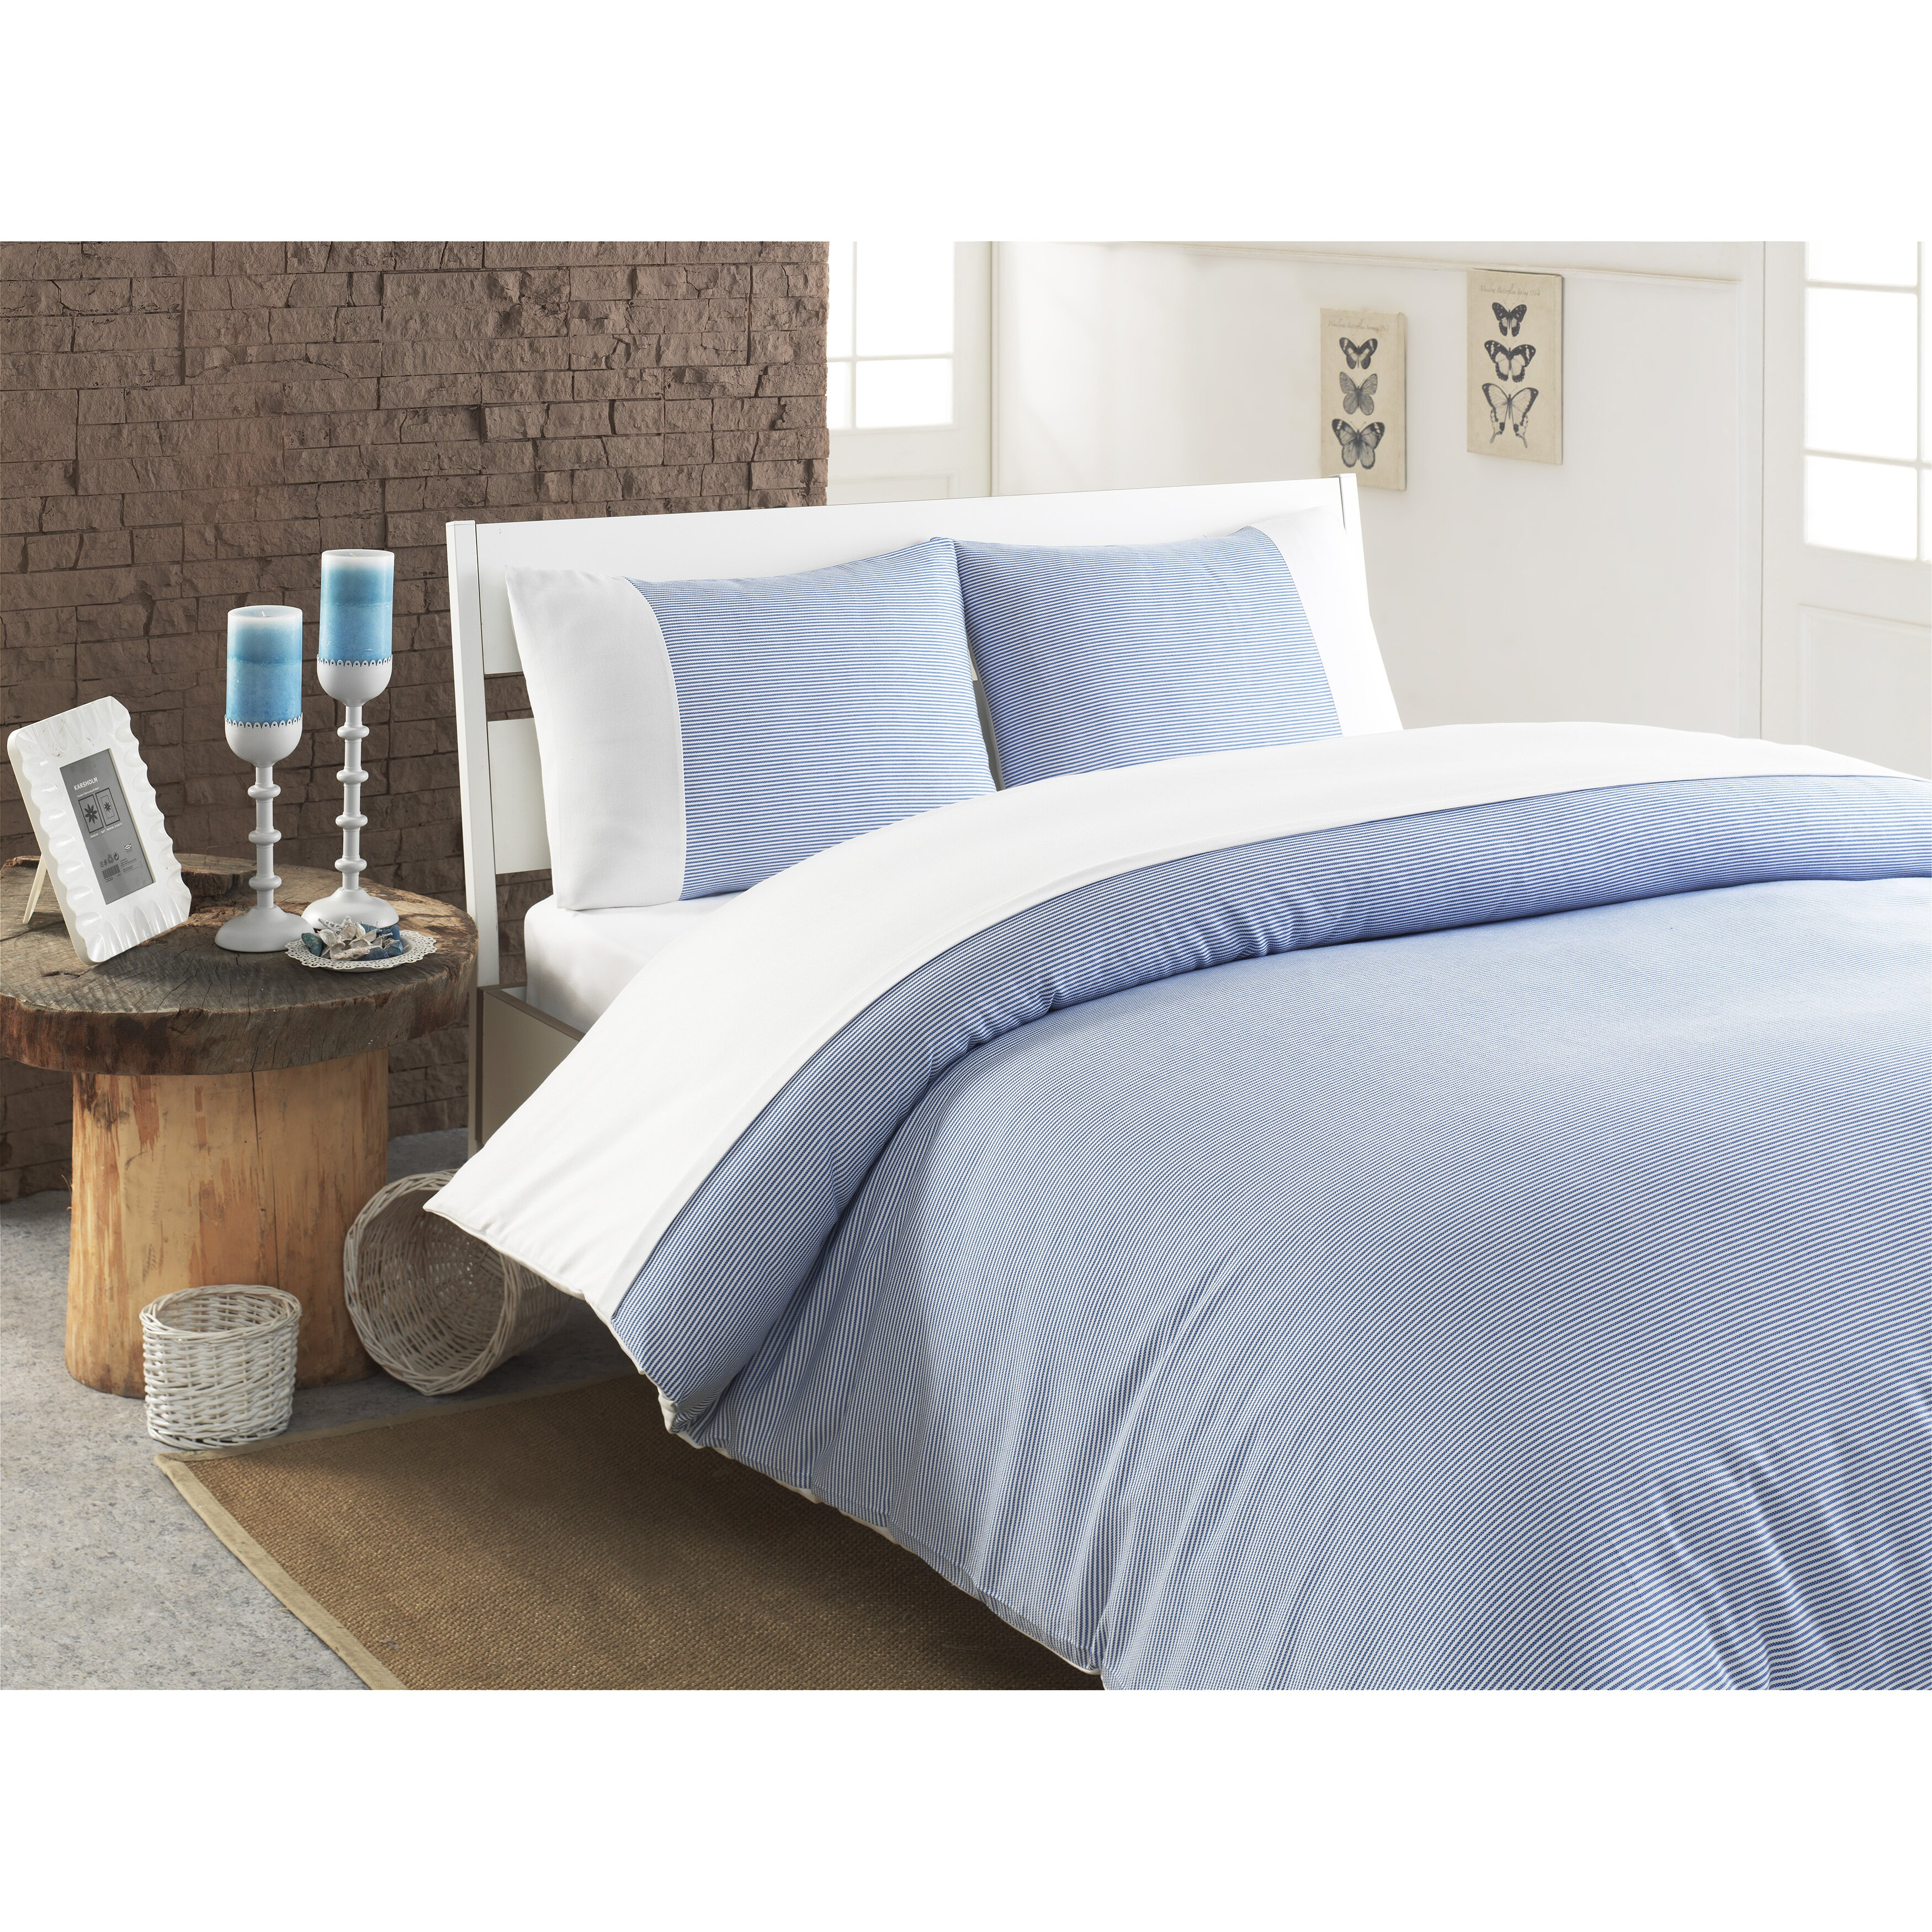 linum home textiles chevas 100 turkish cotton luxury. Black Bedroom Furniture Sets. Home Design Ideas